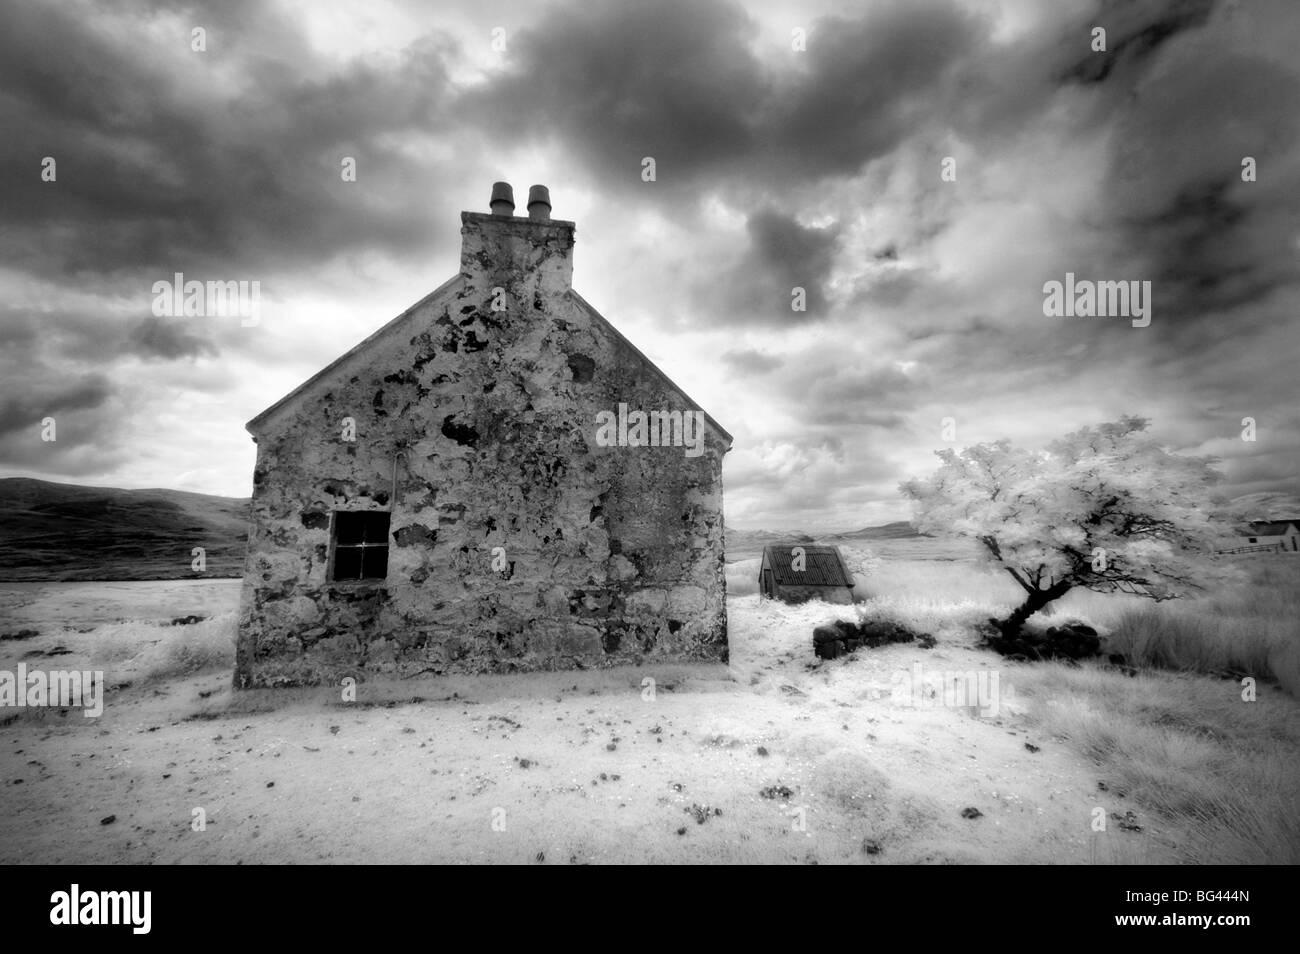 Infrared image of a derelict farmhouse near Arivruach, Isle of Lewis, Hebrides, Scotland, UK Stock Photo